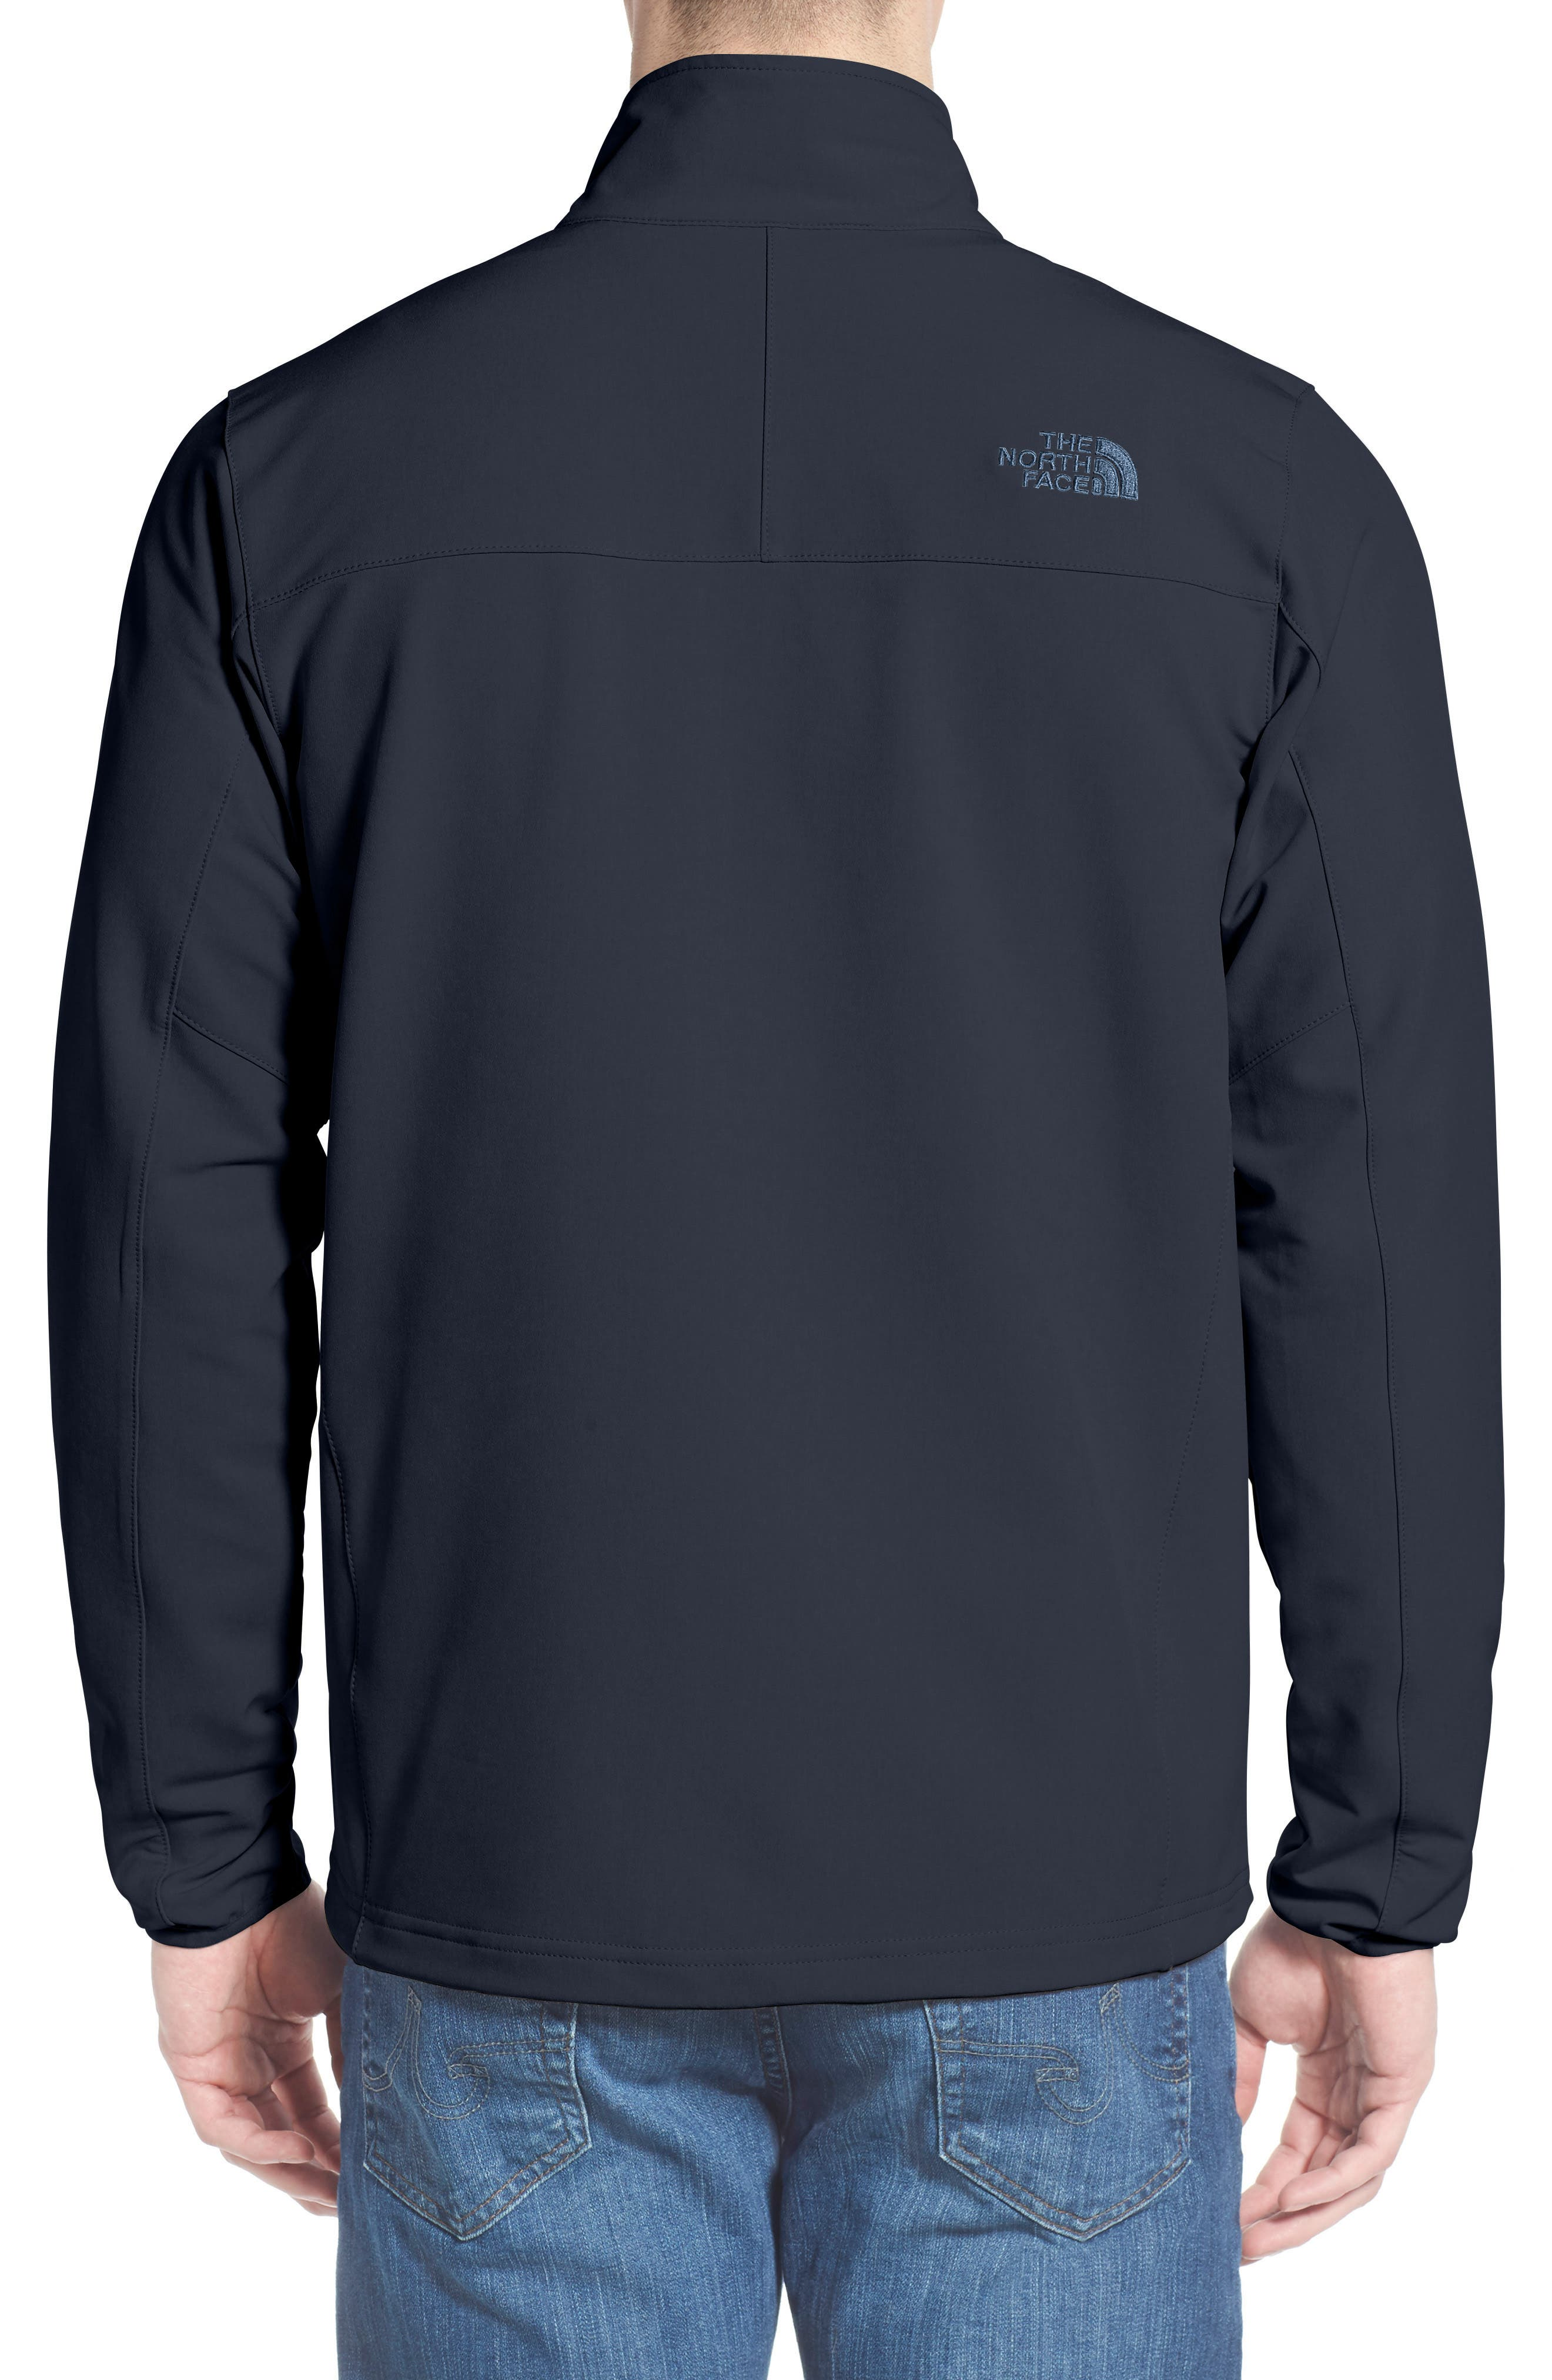 Apex Pneumatic Jacket,                             Main thumbnail 1, color,                             425